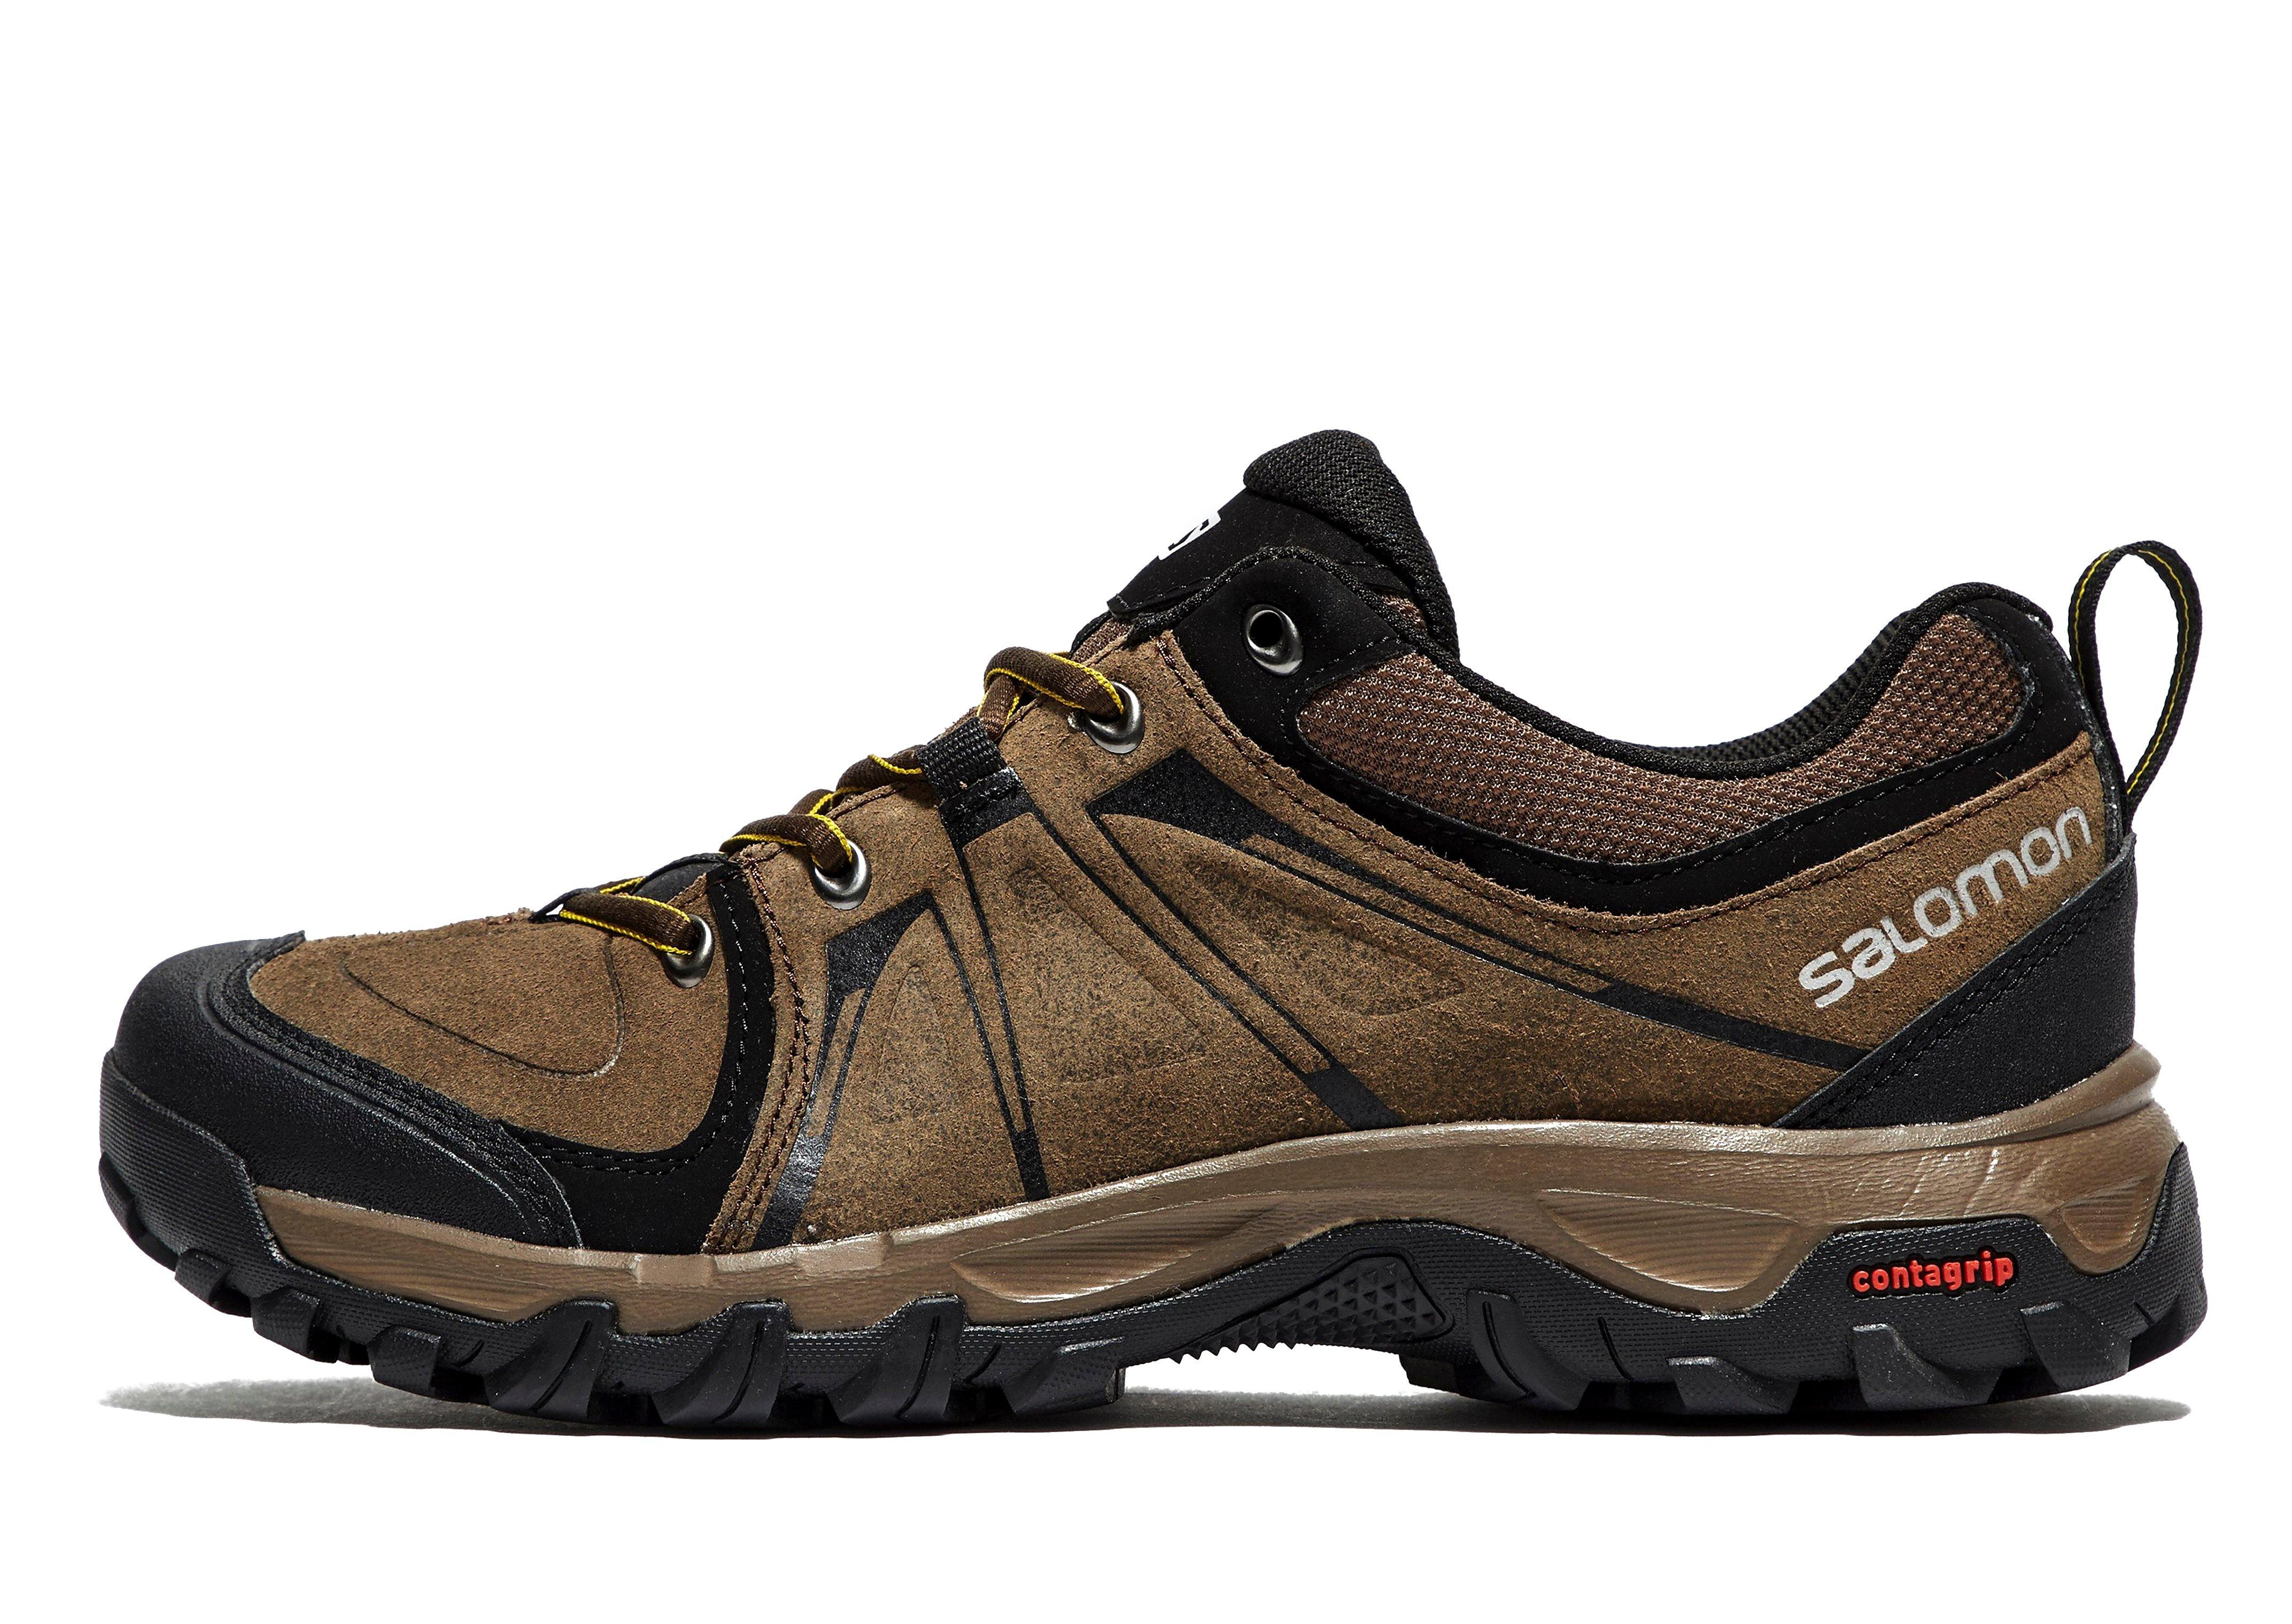 Salomon Ellipse 2 Aero Hiking Shoes Women's